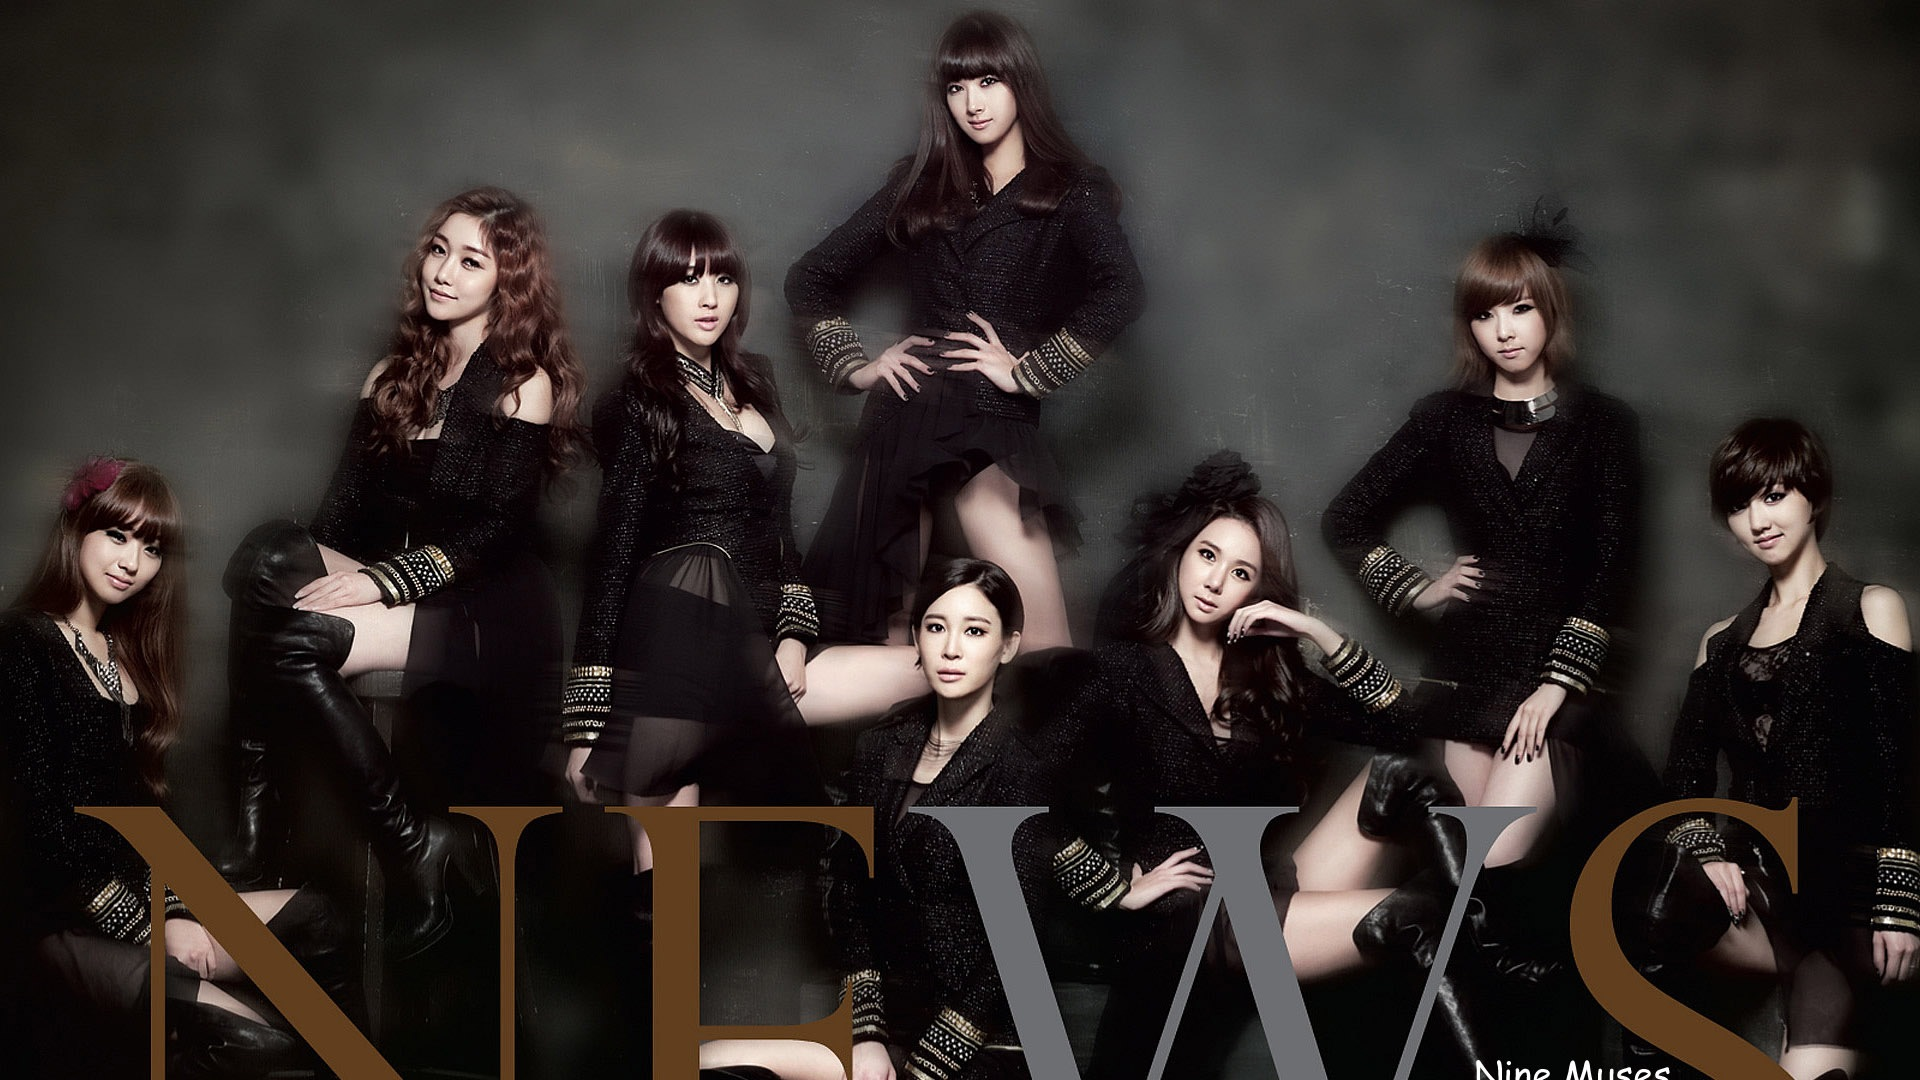 Korean Girl group Nine Muses HD Wallpapers #1 - 1920x1080